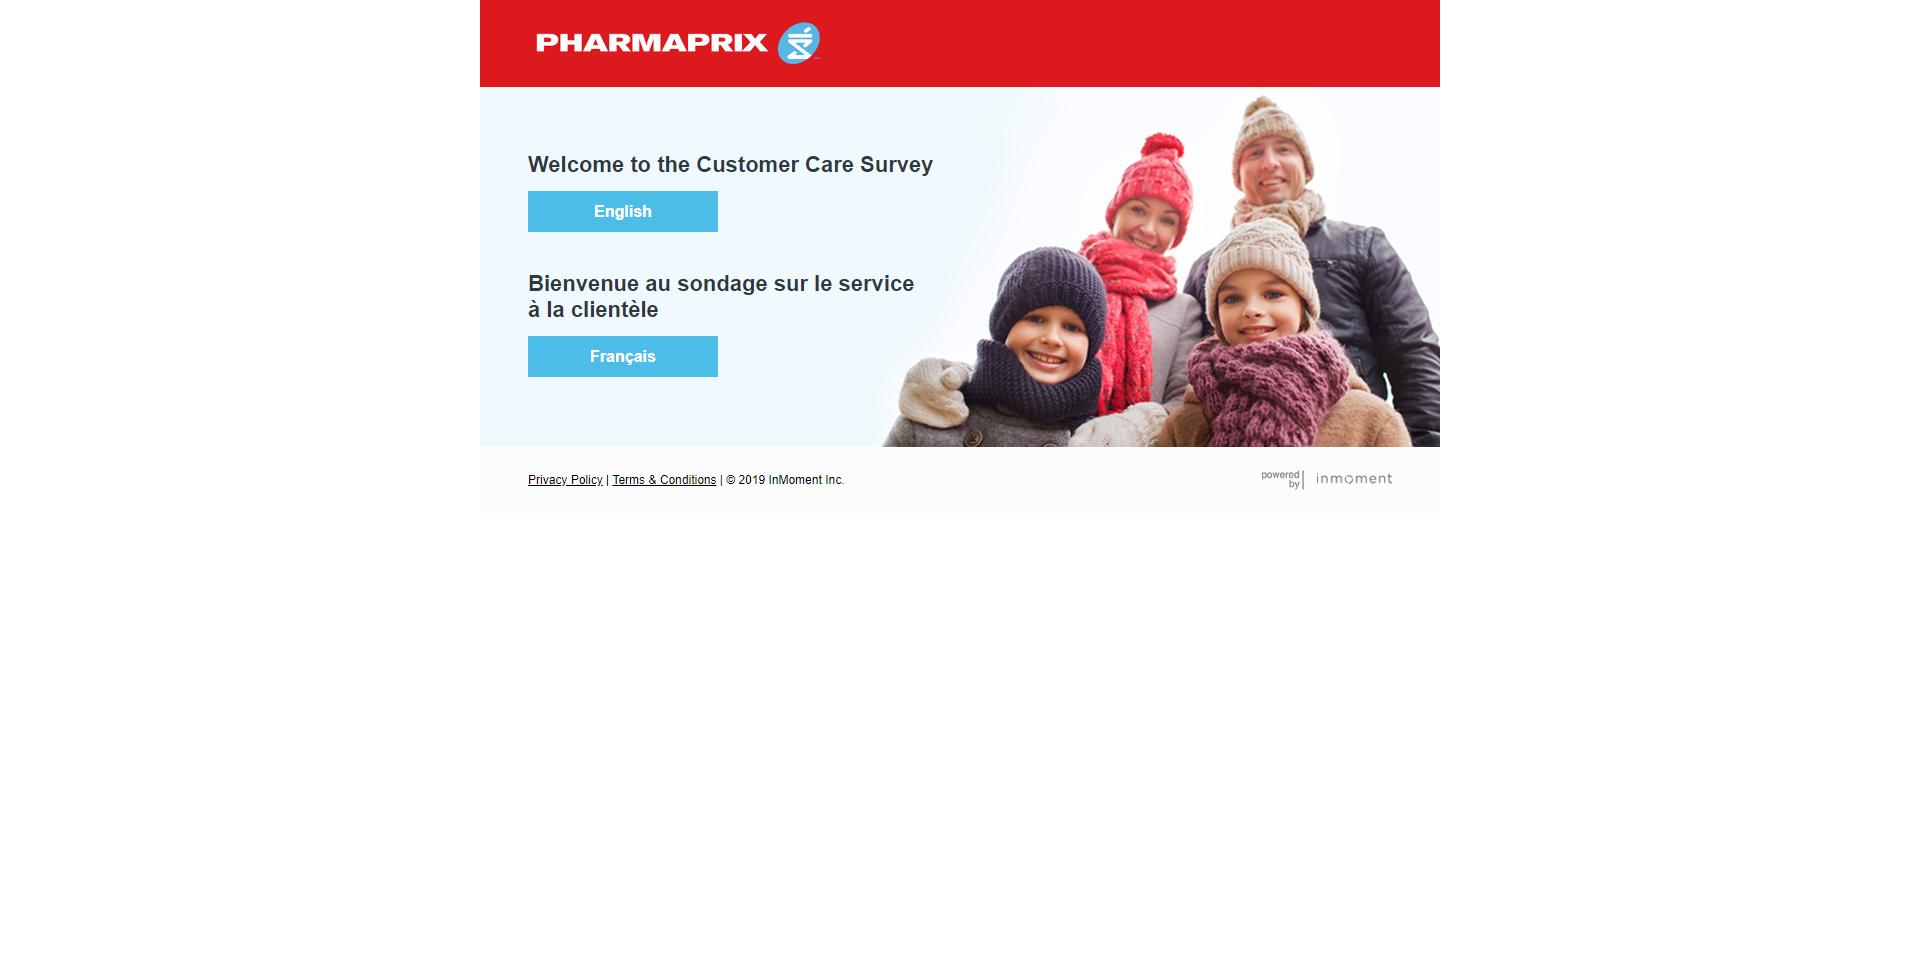 m.pharmaprixsondage.com